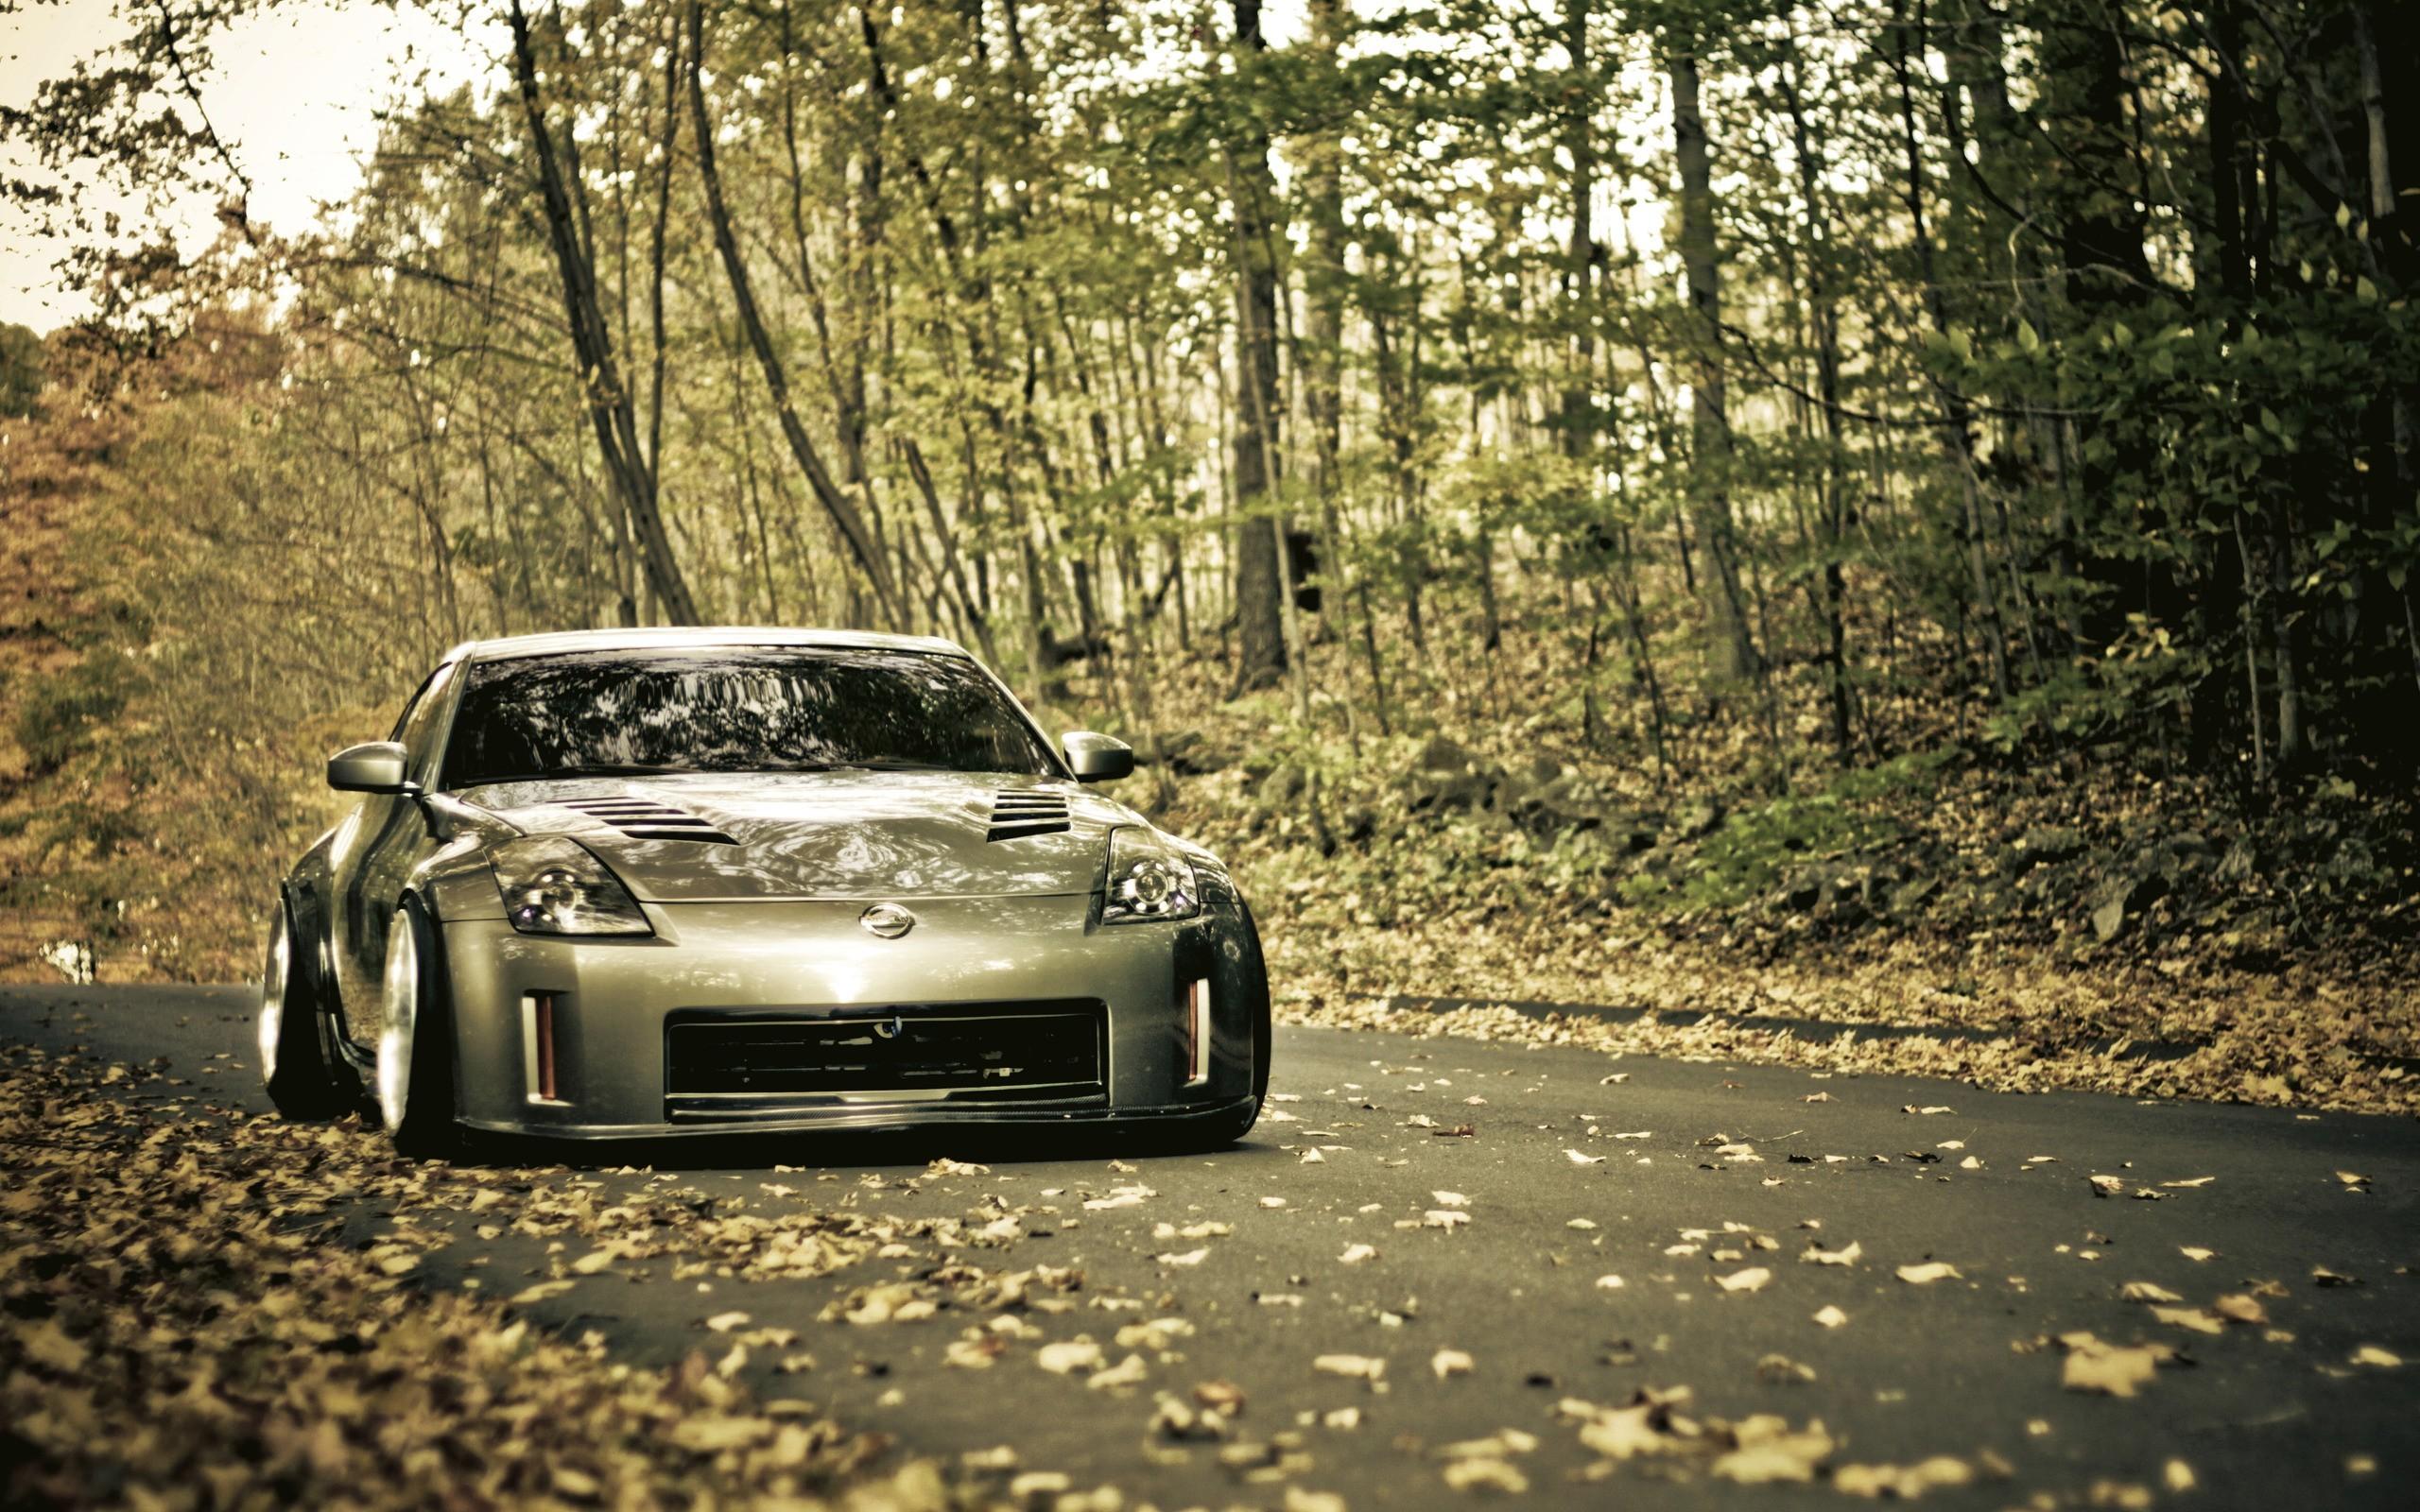 Car Vehicle Nissan Lexus Sports Car Nissan 350Z Tuning Nissan GT R  Performance Car Wheel Supercar